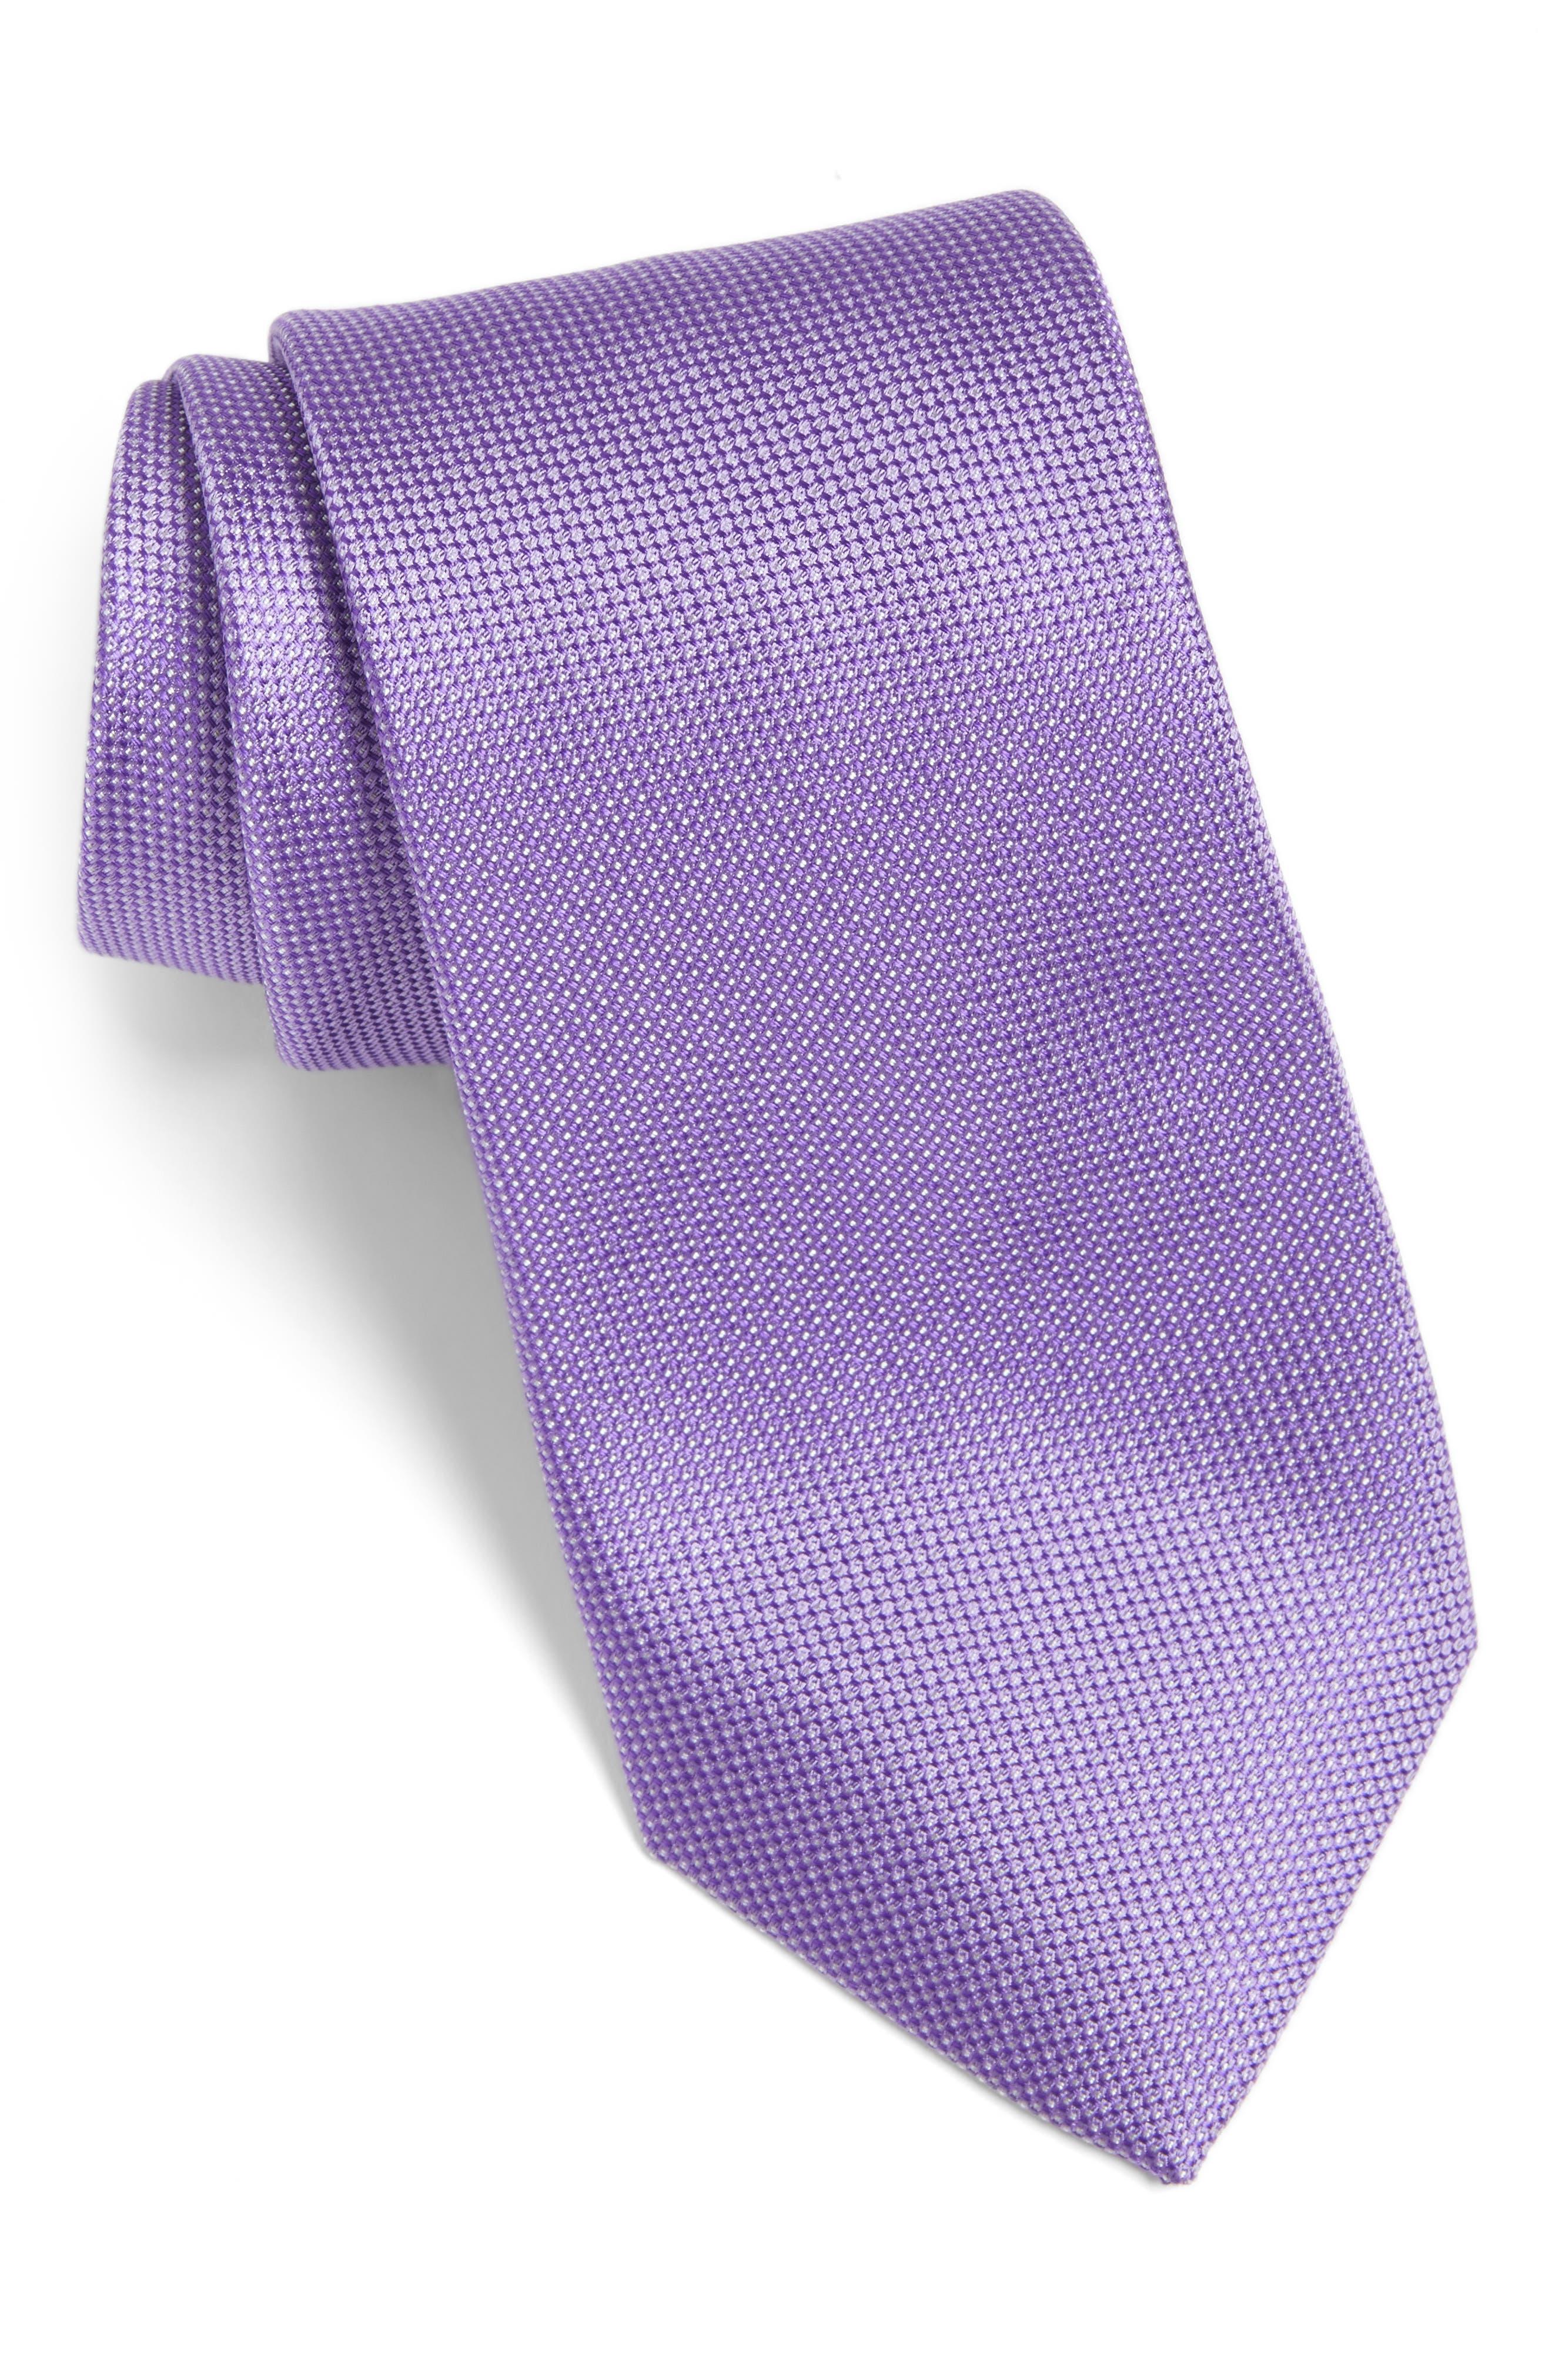 Alternate Image 1 Selected - Calibrate Rawson Solid Silk Tie